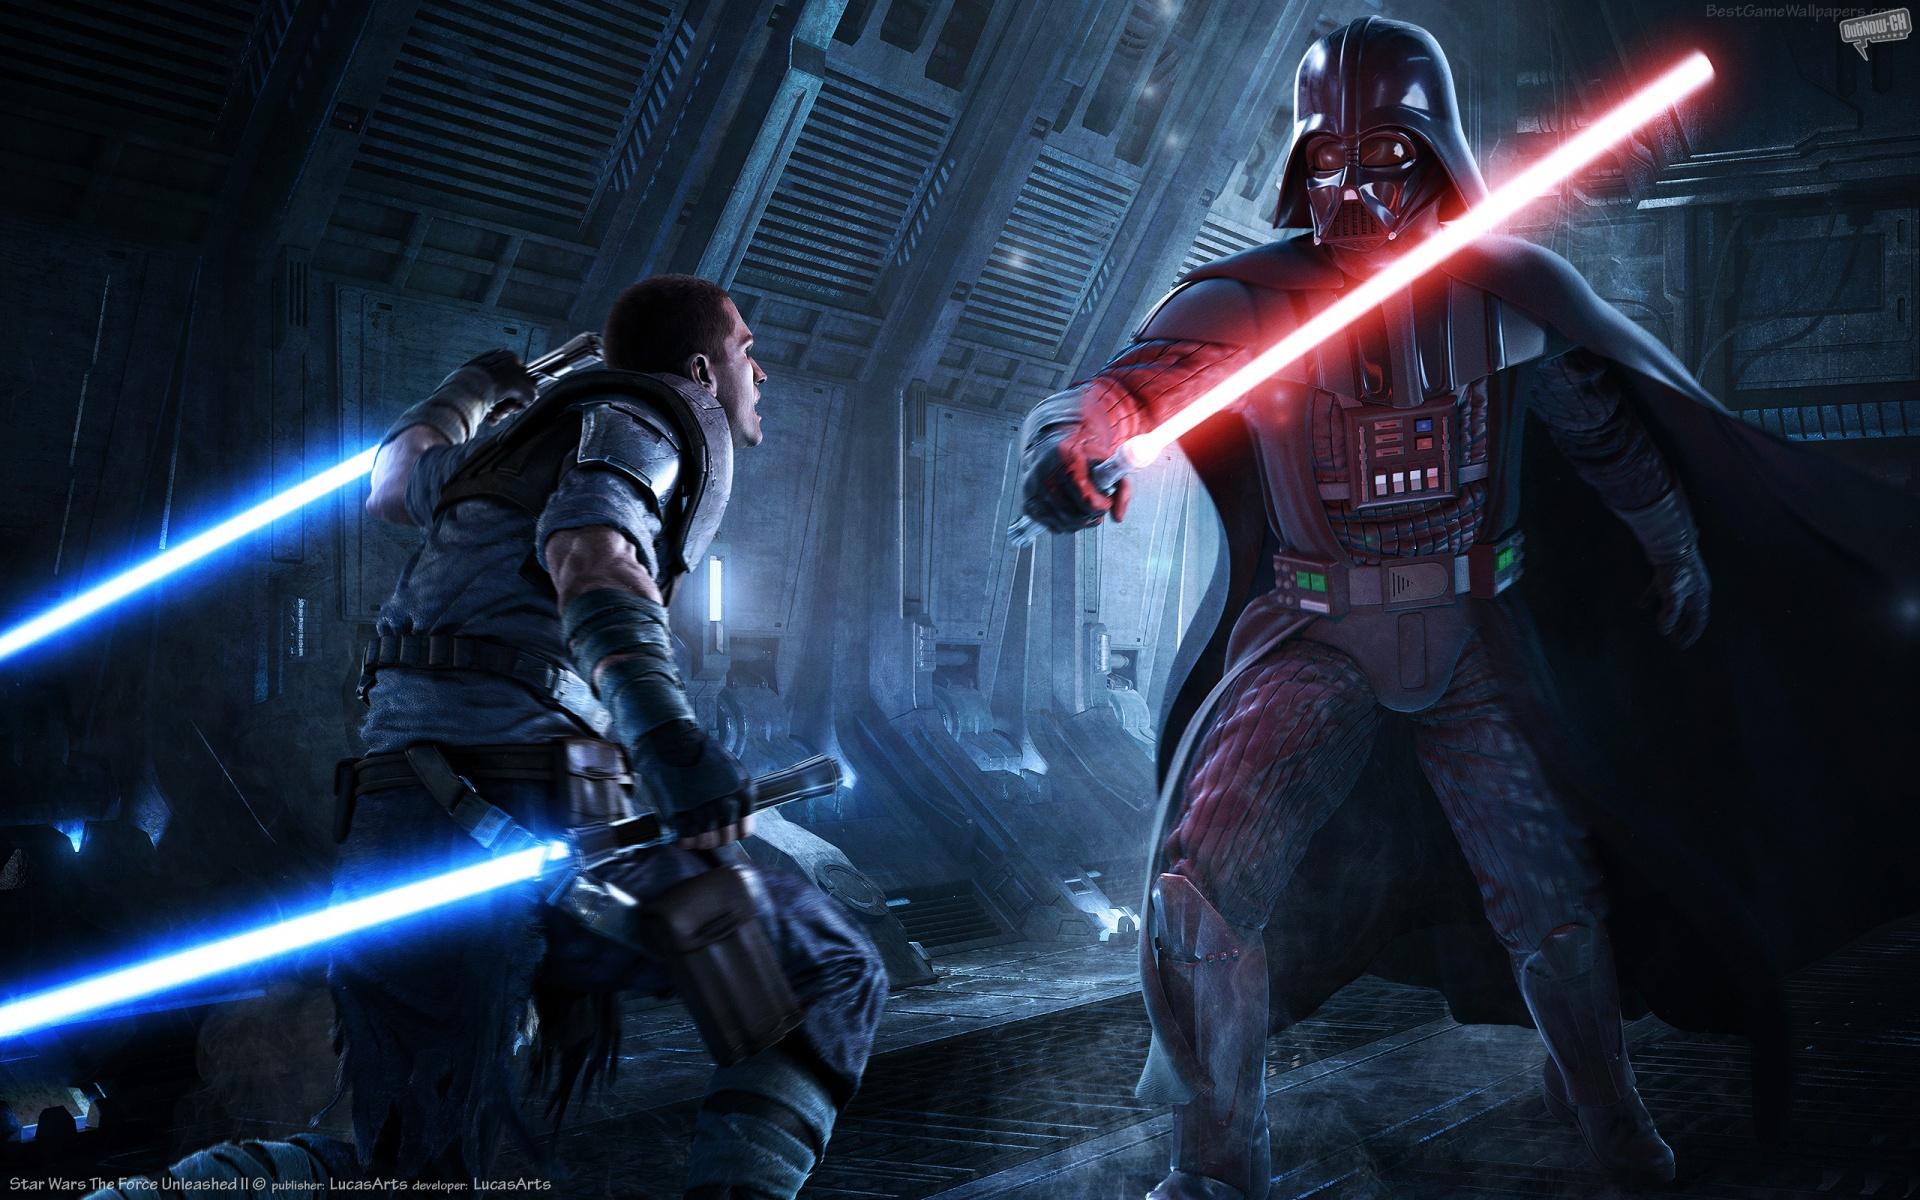 star wars the force unleashed ii wallpaper 01 image - arek15arekde